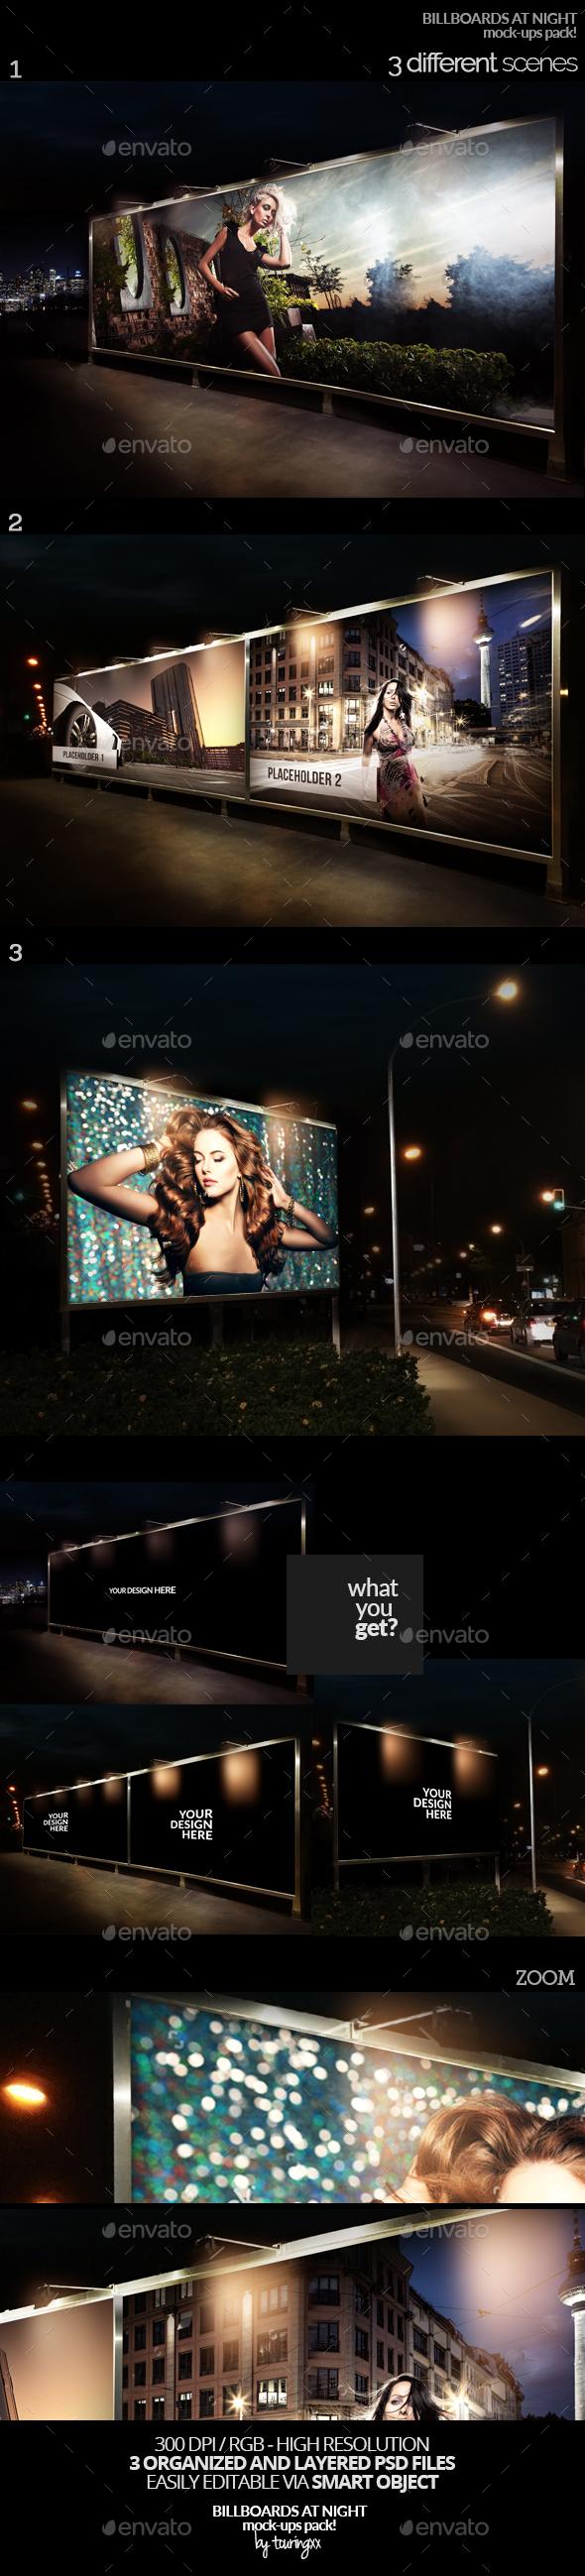 Billboards At Night Mock-Ups Pack - Product Mock-Ups Graphics